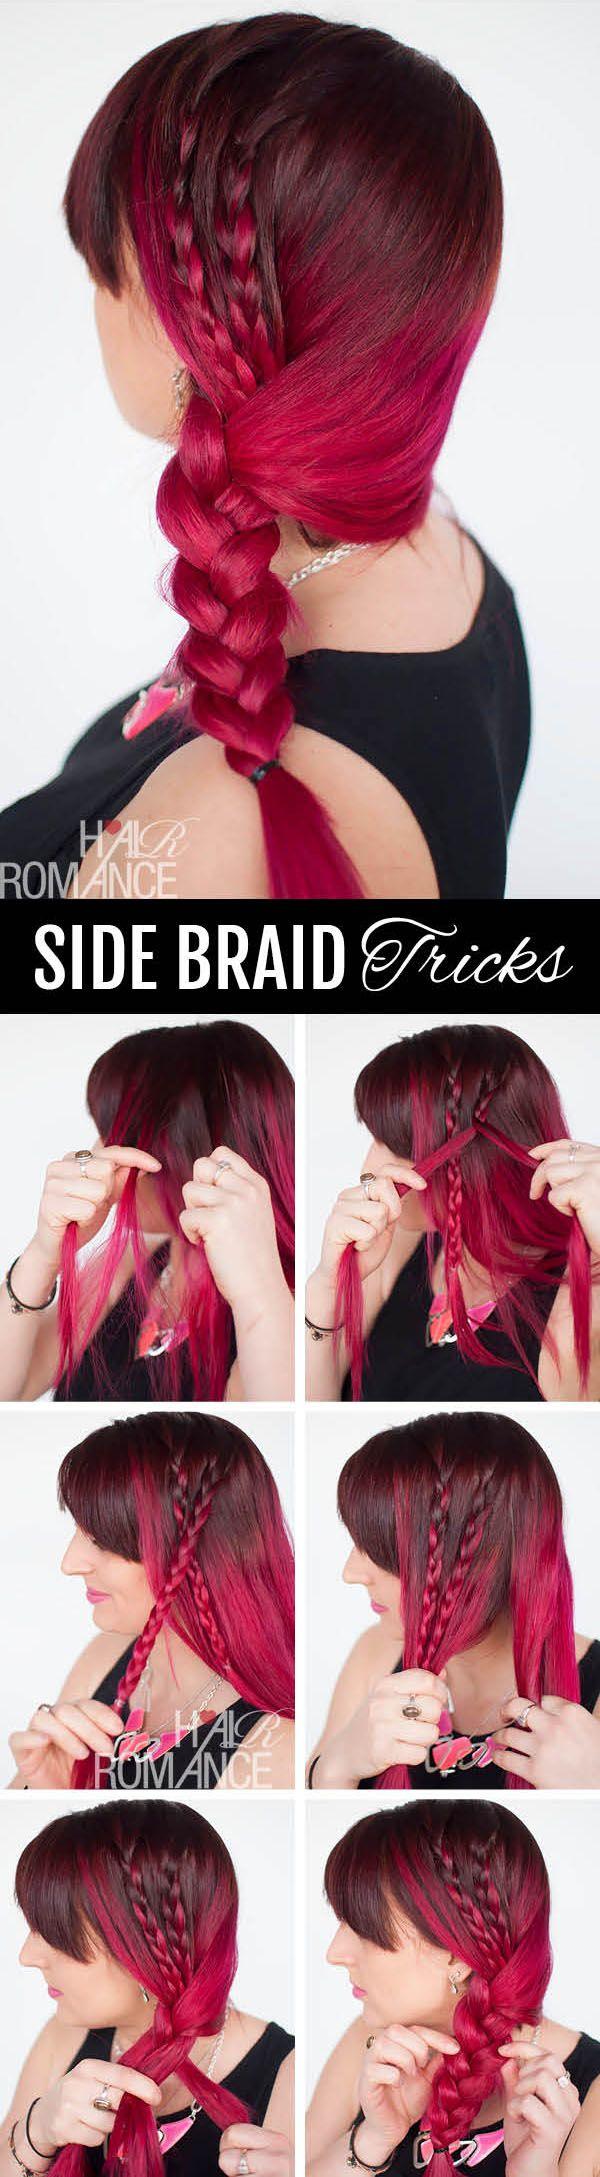 Hair Romance - side braid hairstyle tutorial plus tricks